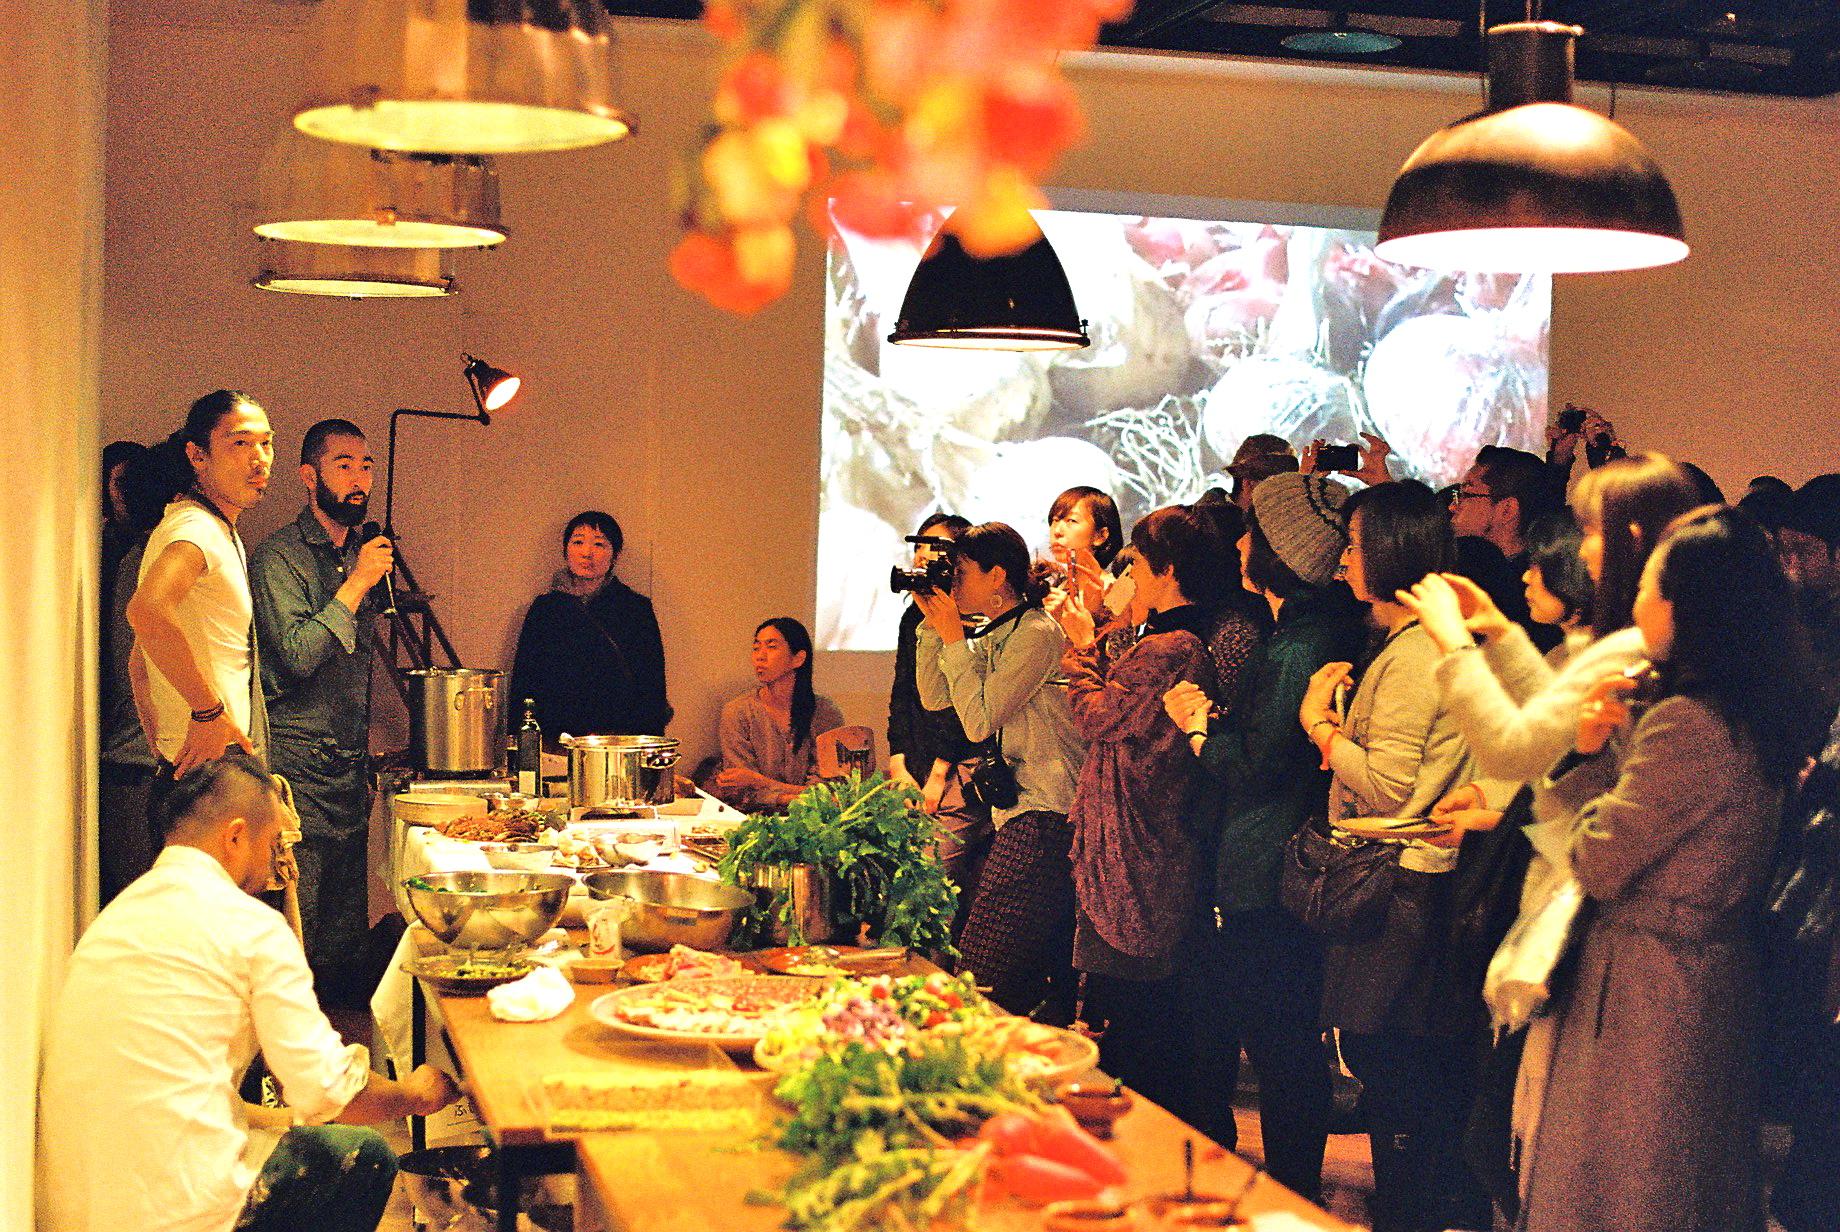 Nomadic Kitchenとして活動する料理人たちからもご挨拶。